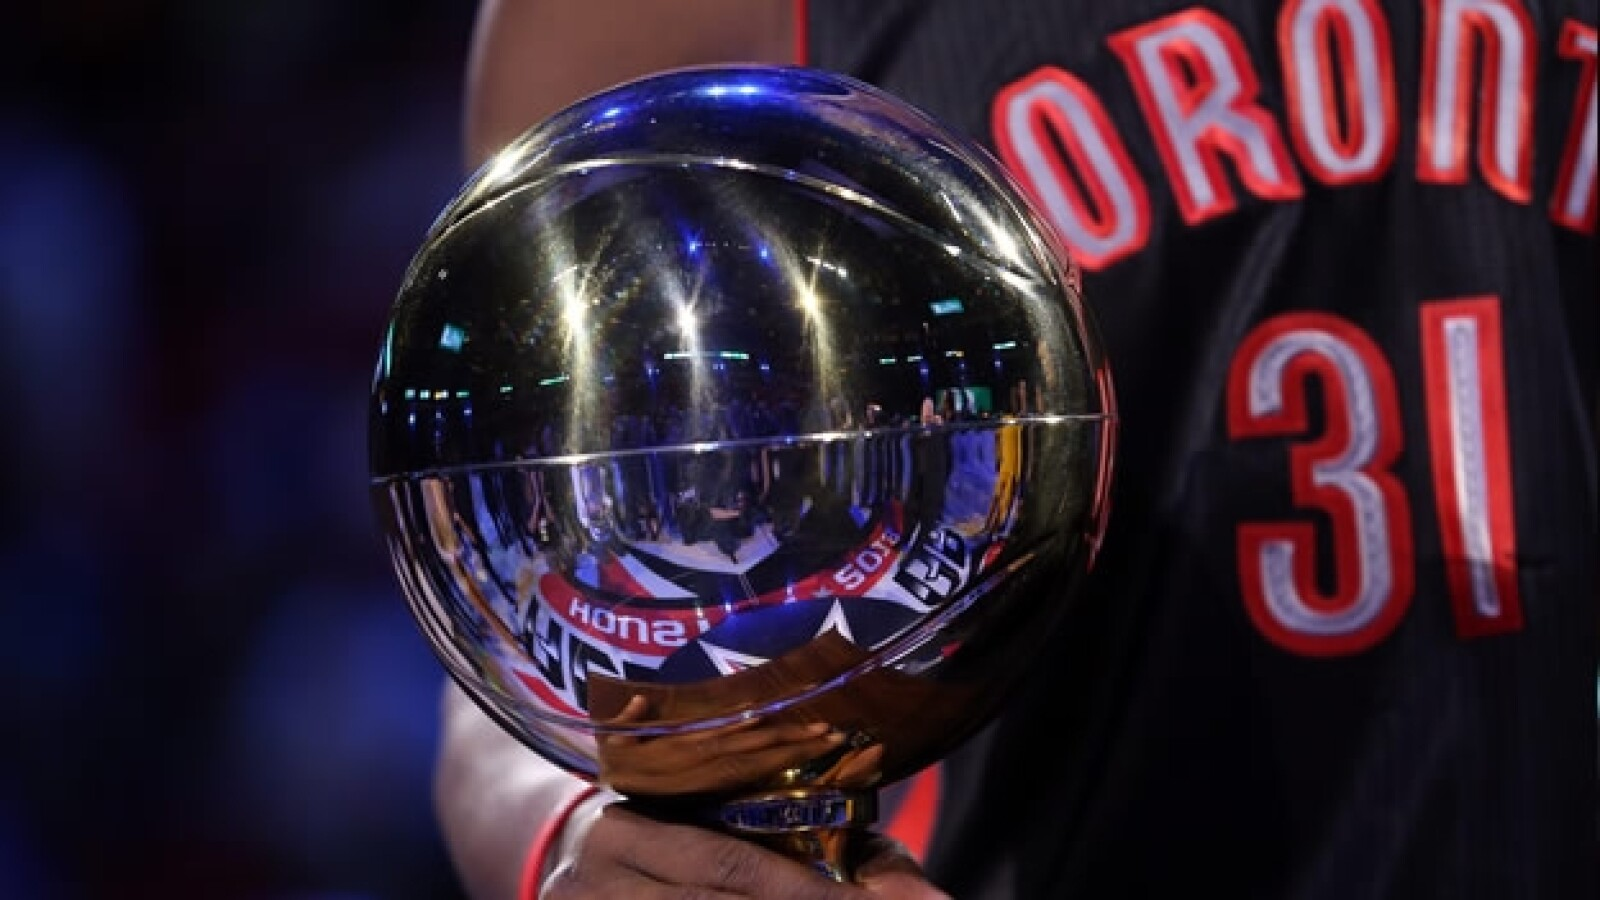 basquetbol. nba, deportes